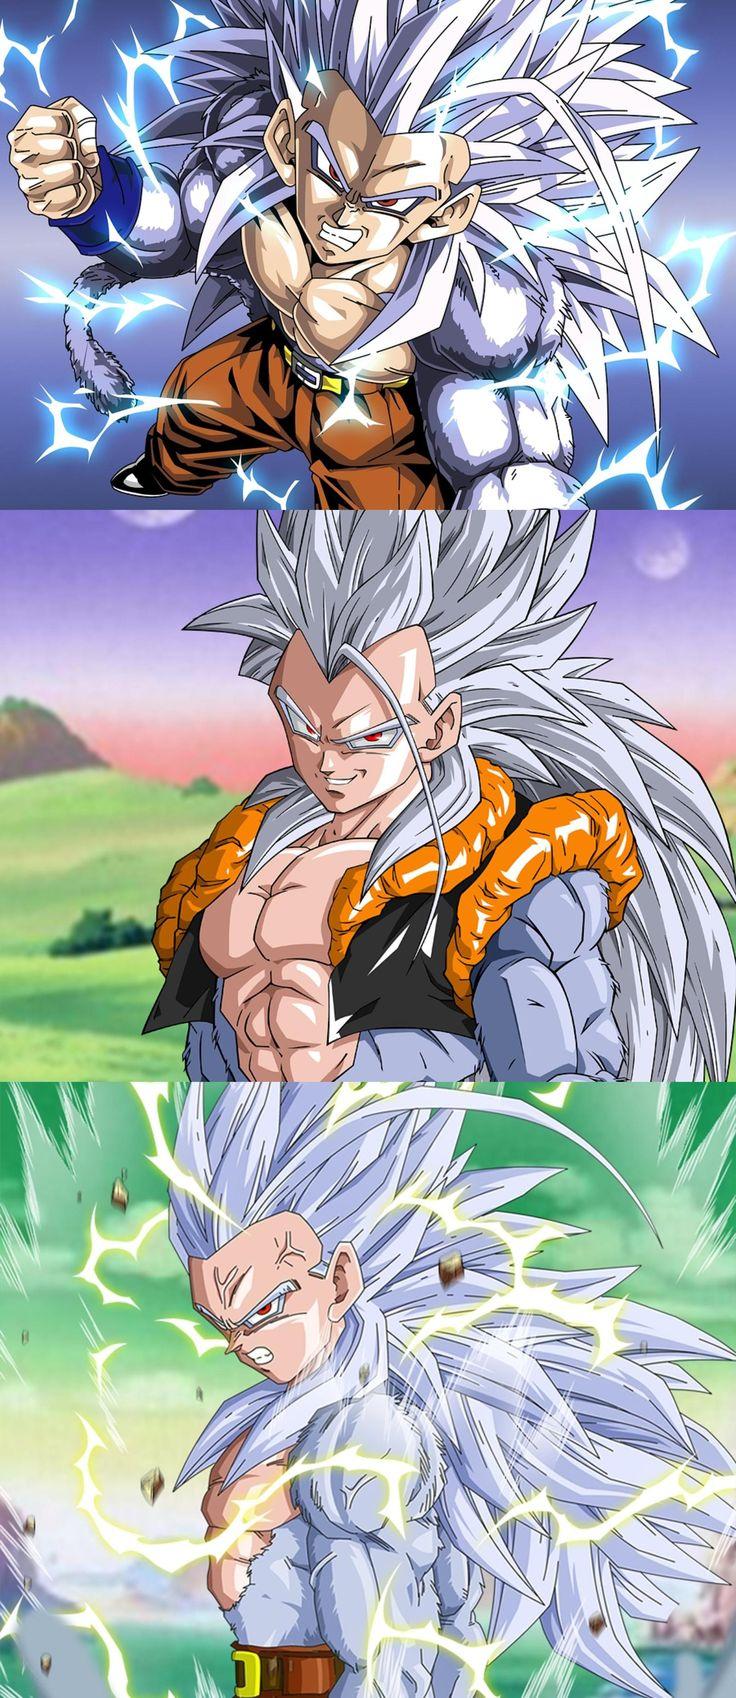 Super Saiyan 5 Gohan